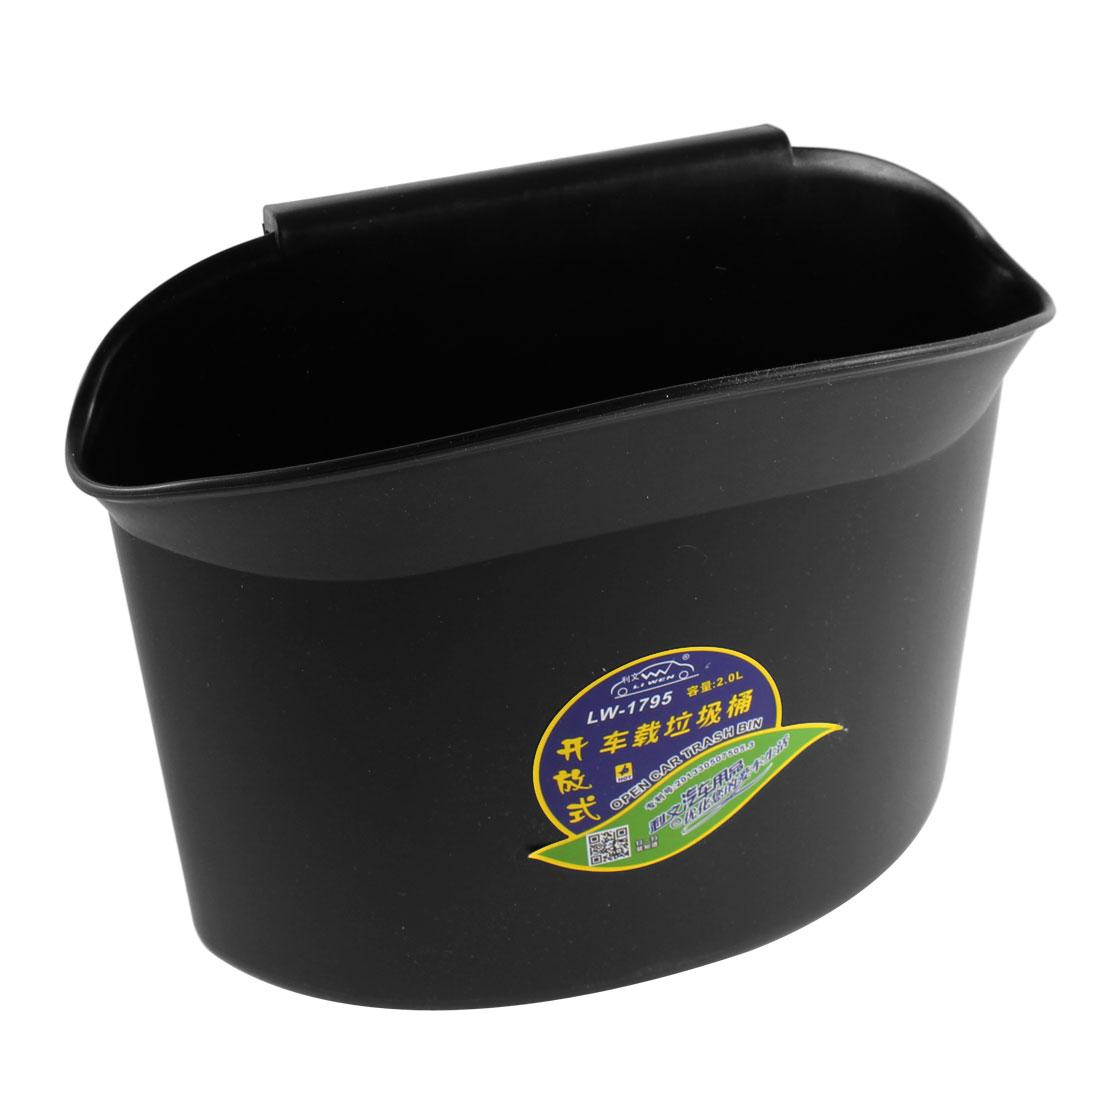 Car Black Plastic Trash Rubbish Garbage Bin Box Can Holder